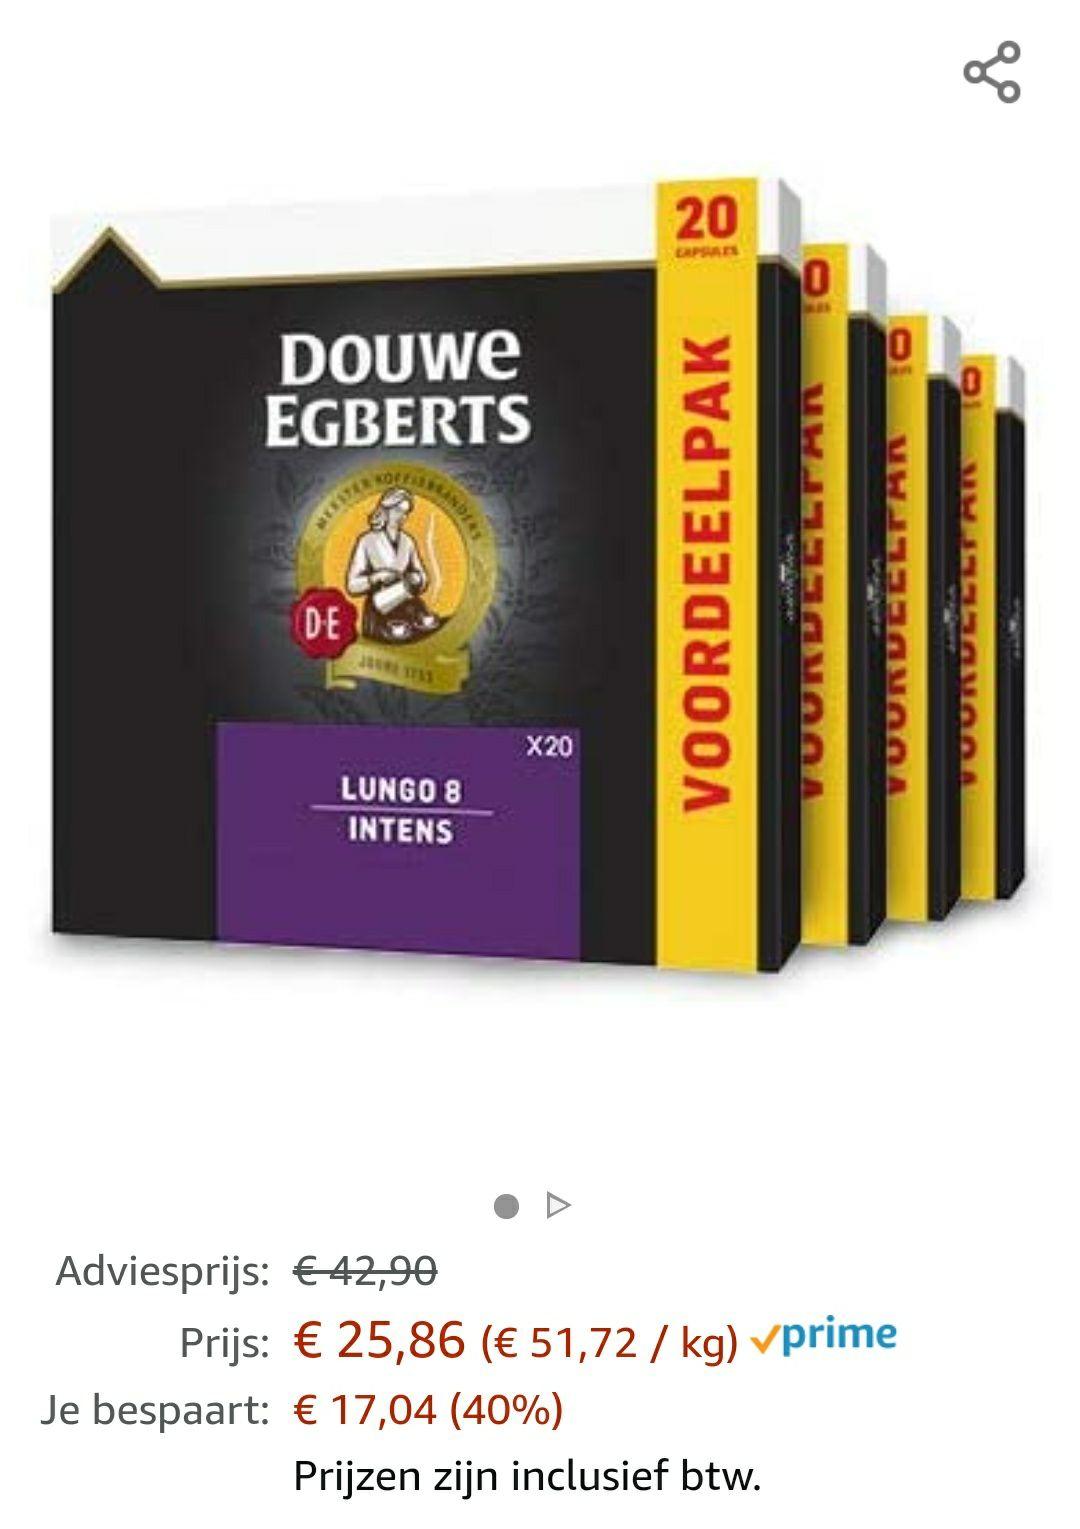 Douwe Egberts Lungo 8 (200 cups)